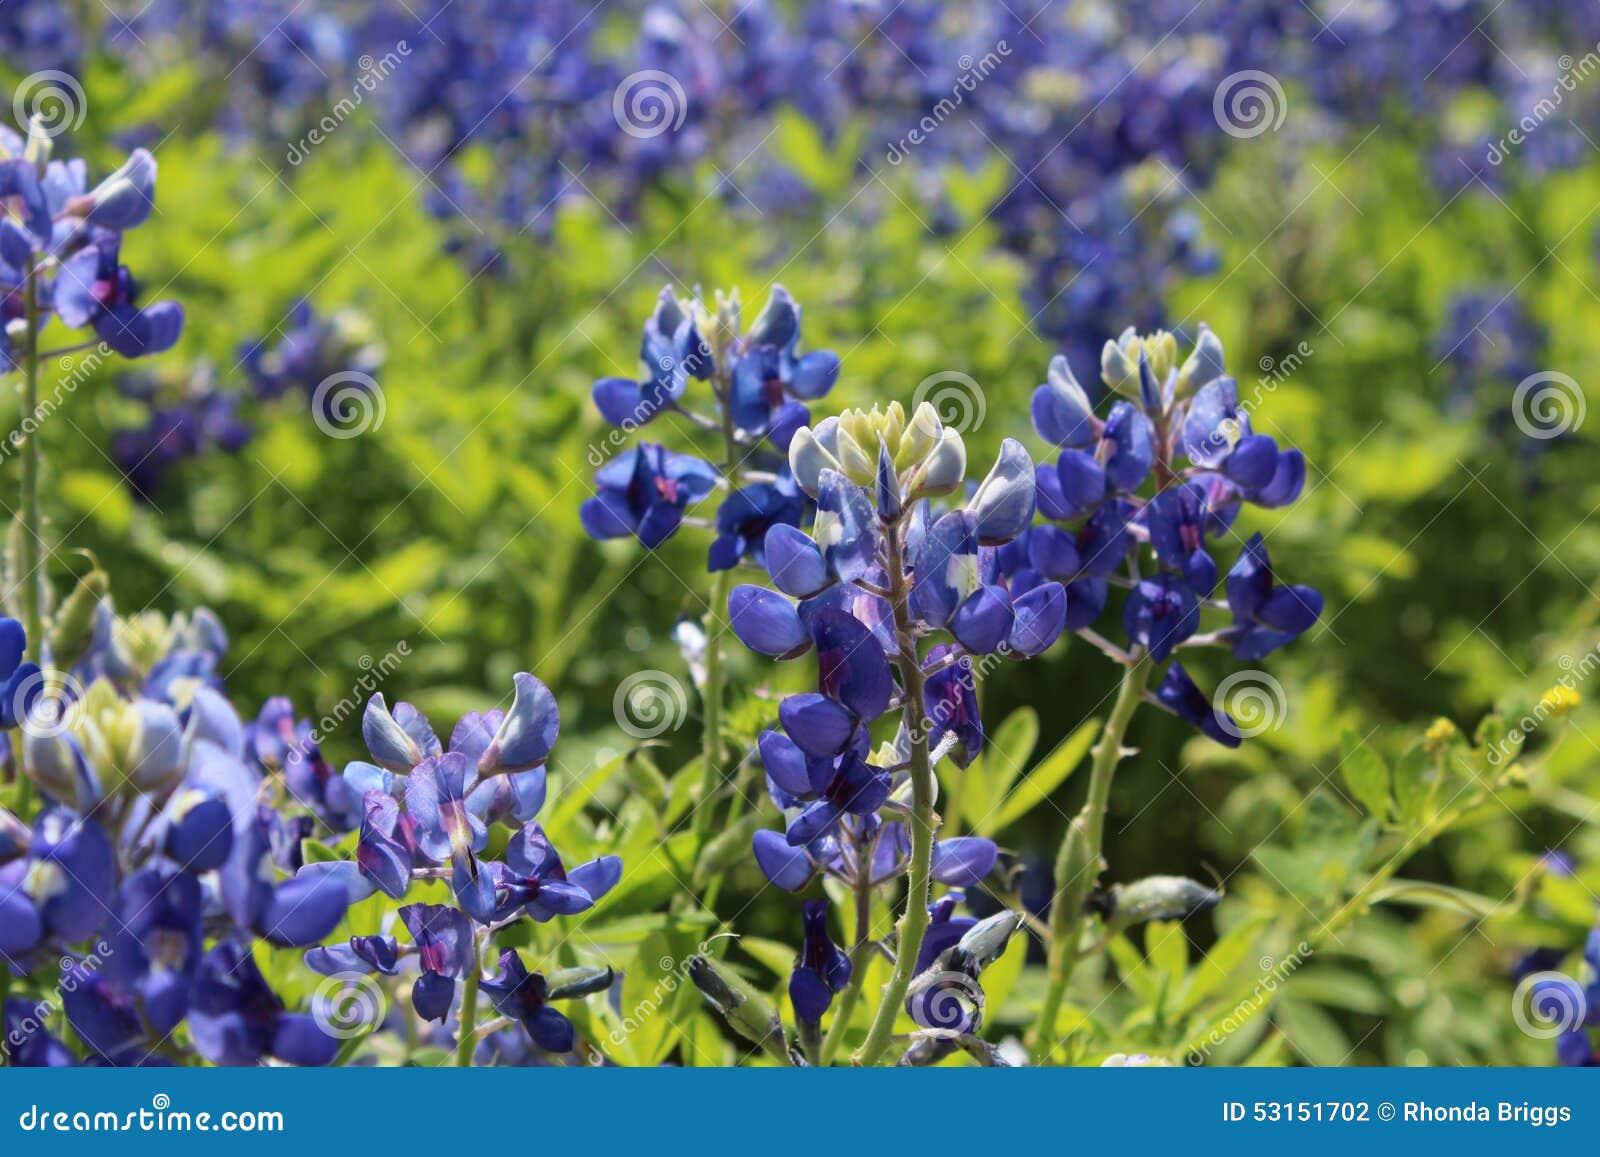 Helder Texas Bluebonnets